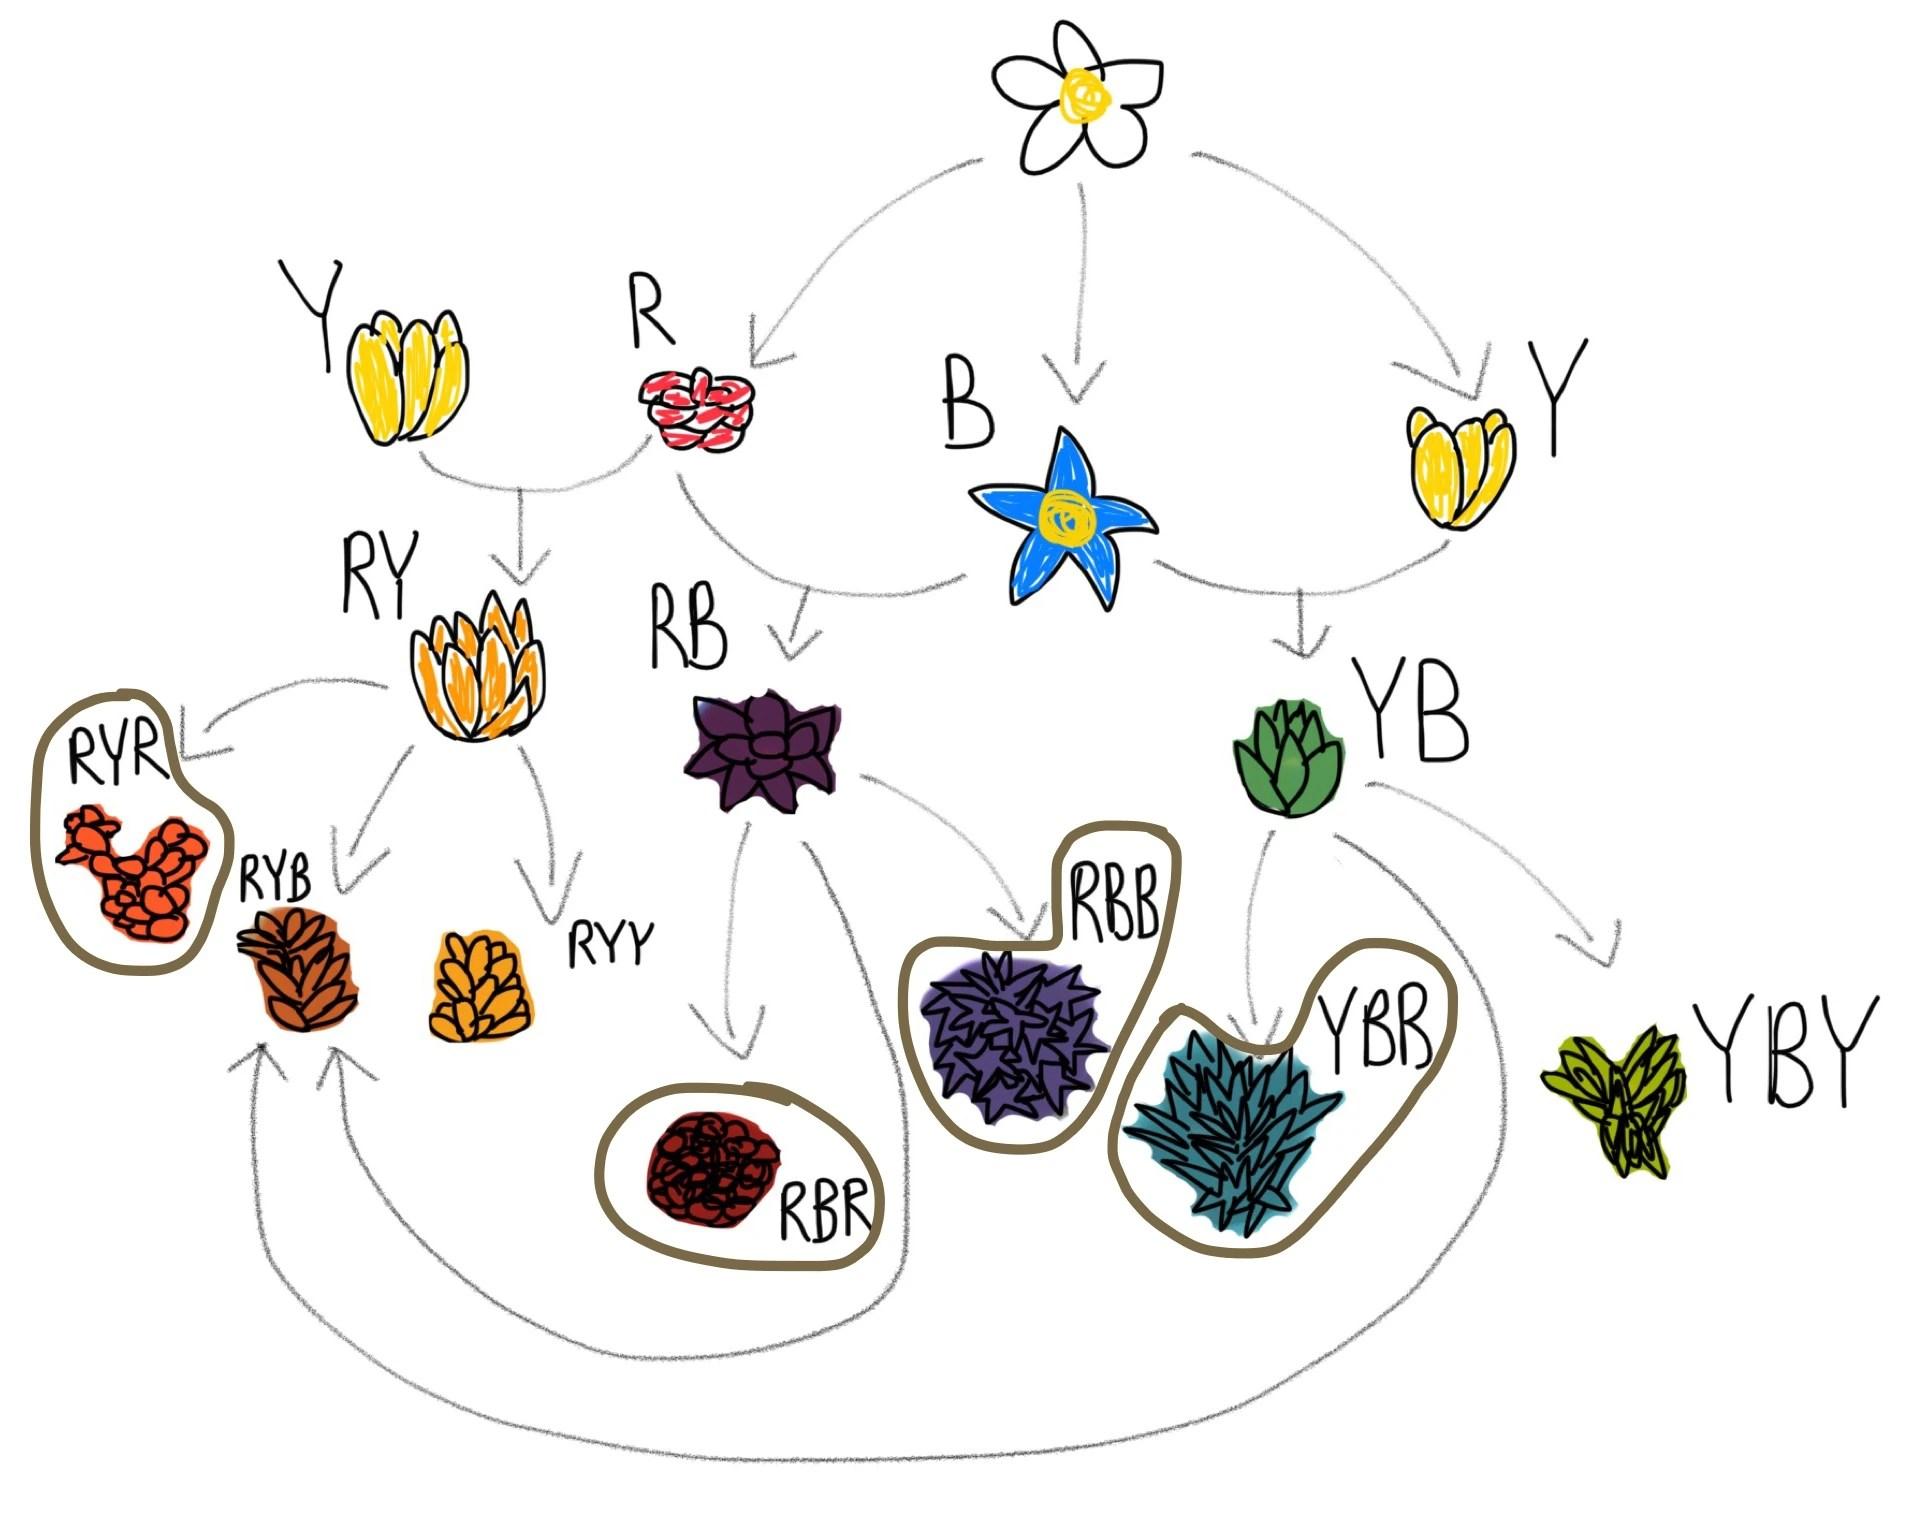 hight resolution of flowerdiagram